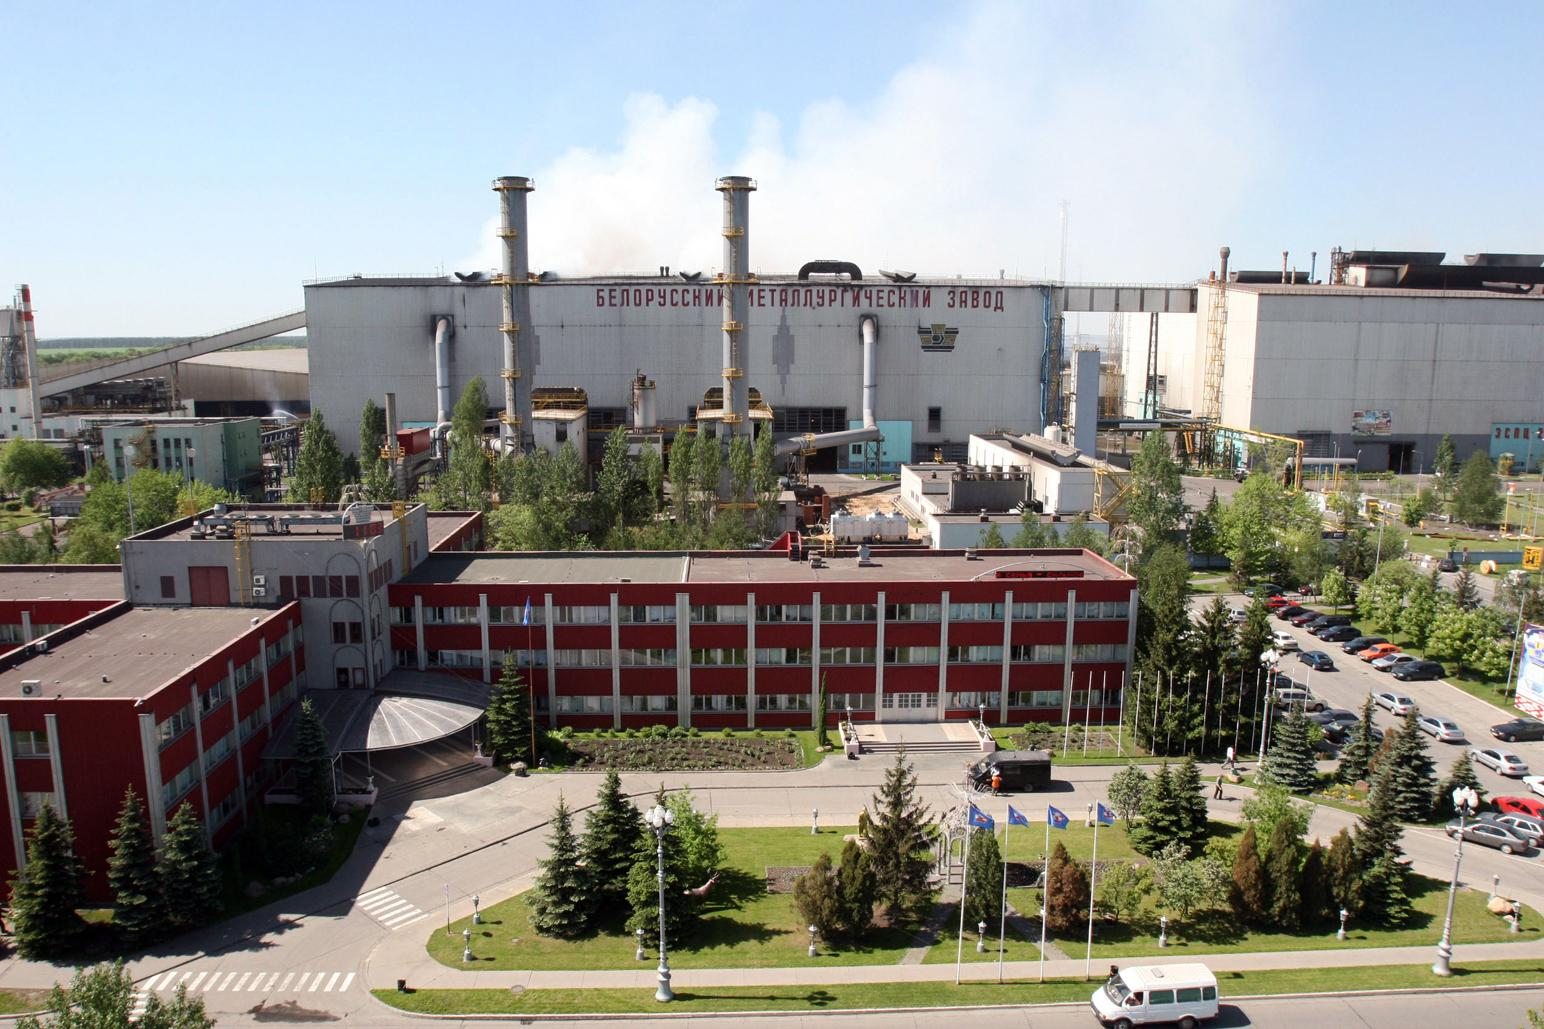 Continental и Жлобинский БМЗ подписали рекордный контракт на поставку металлокорда